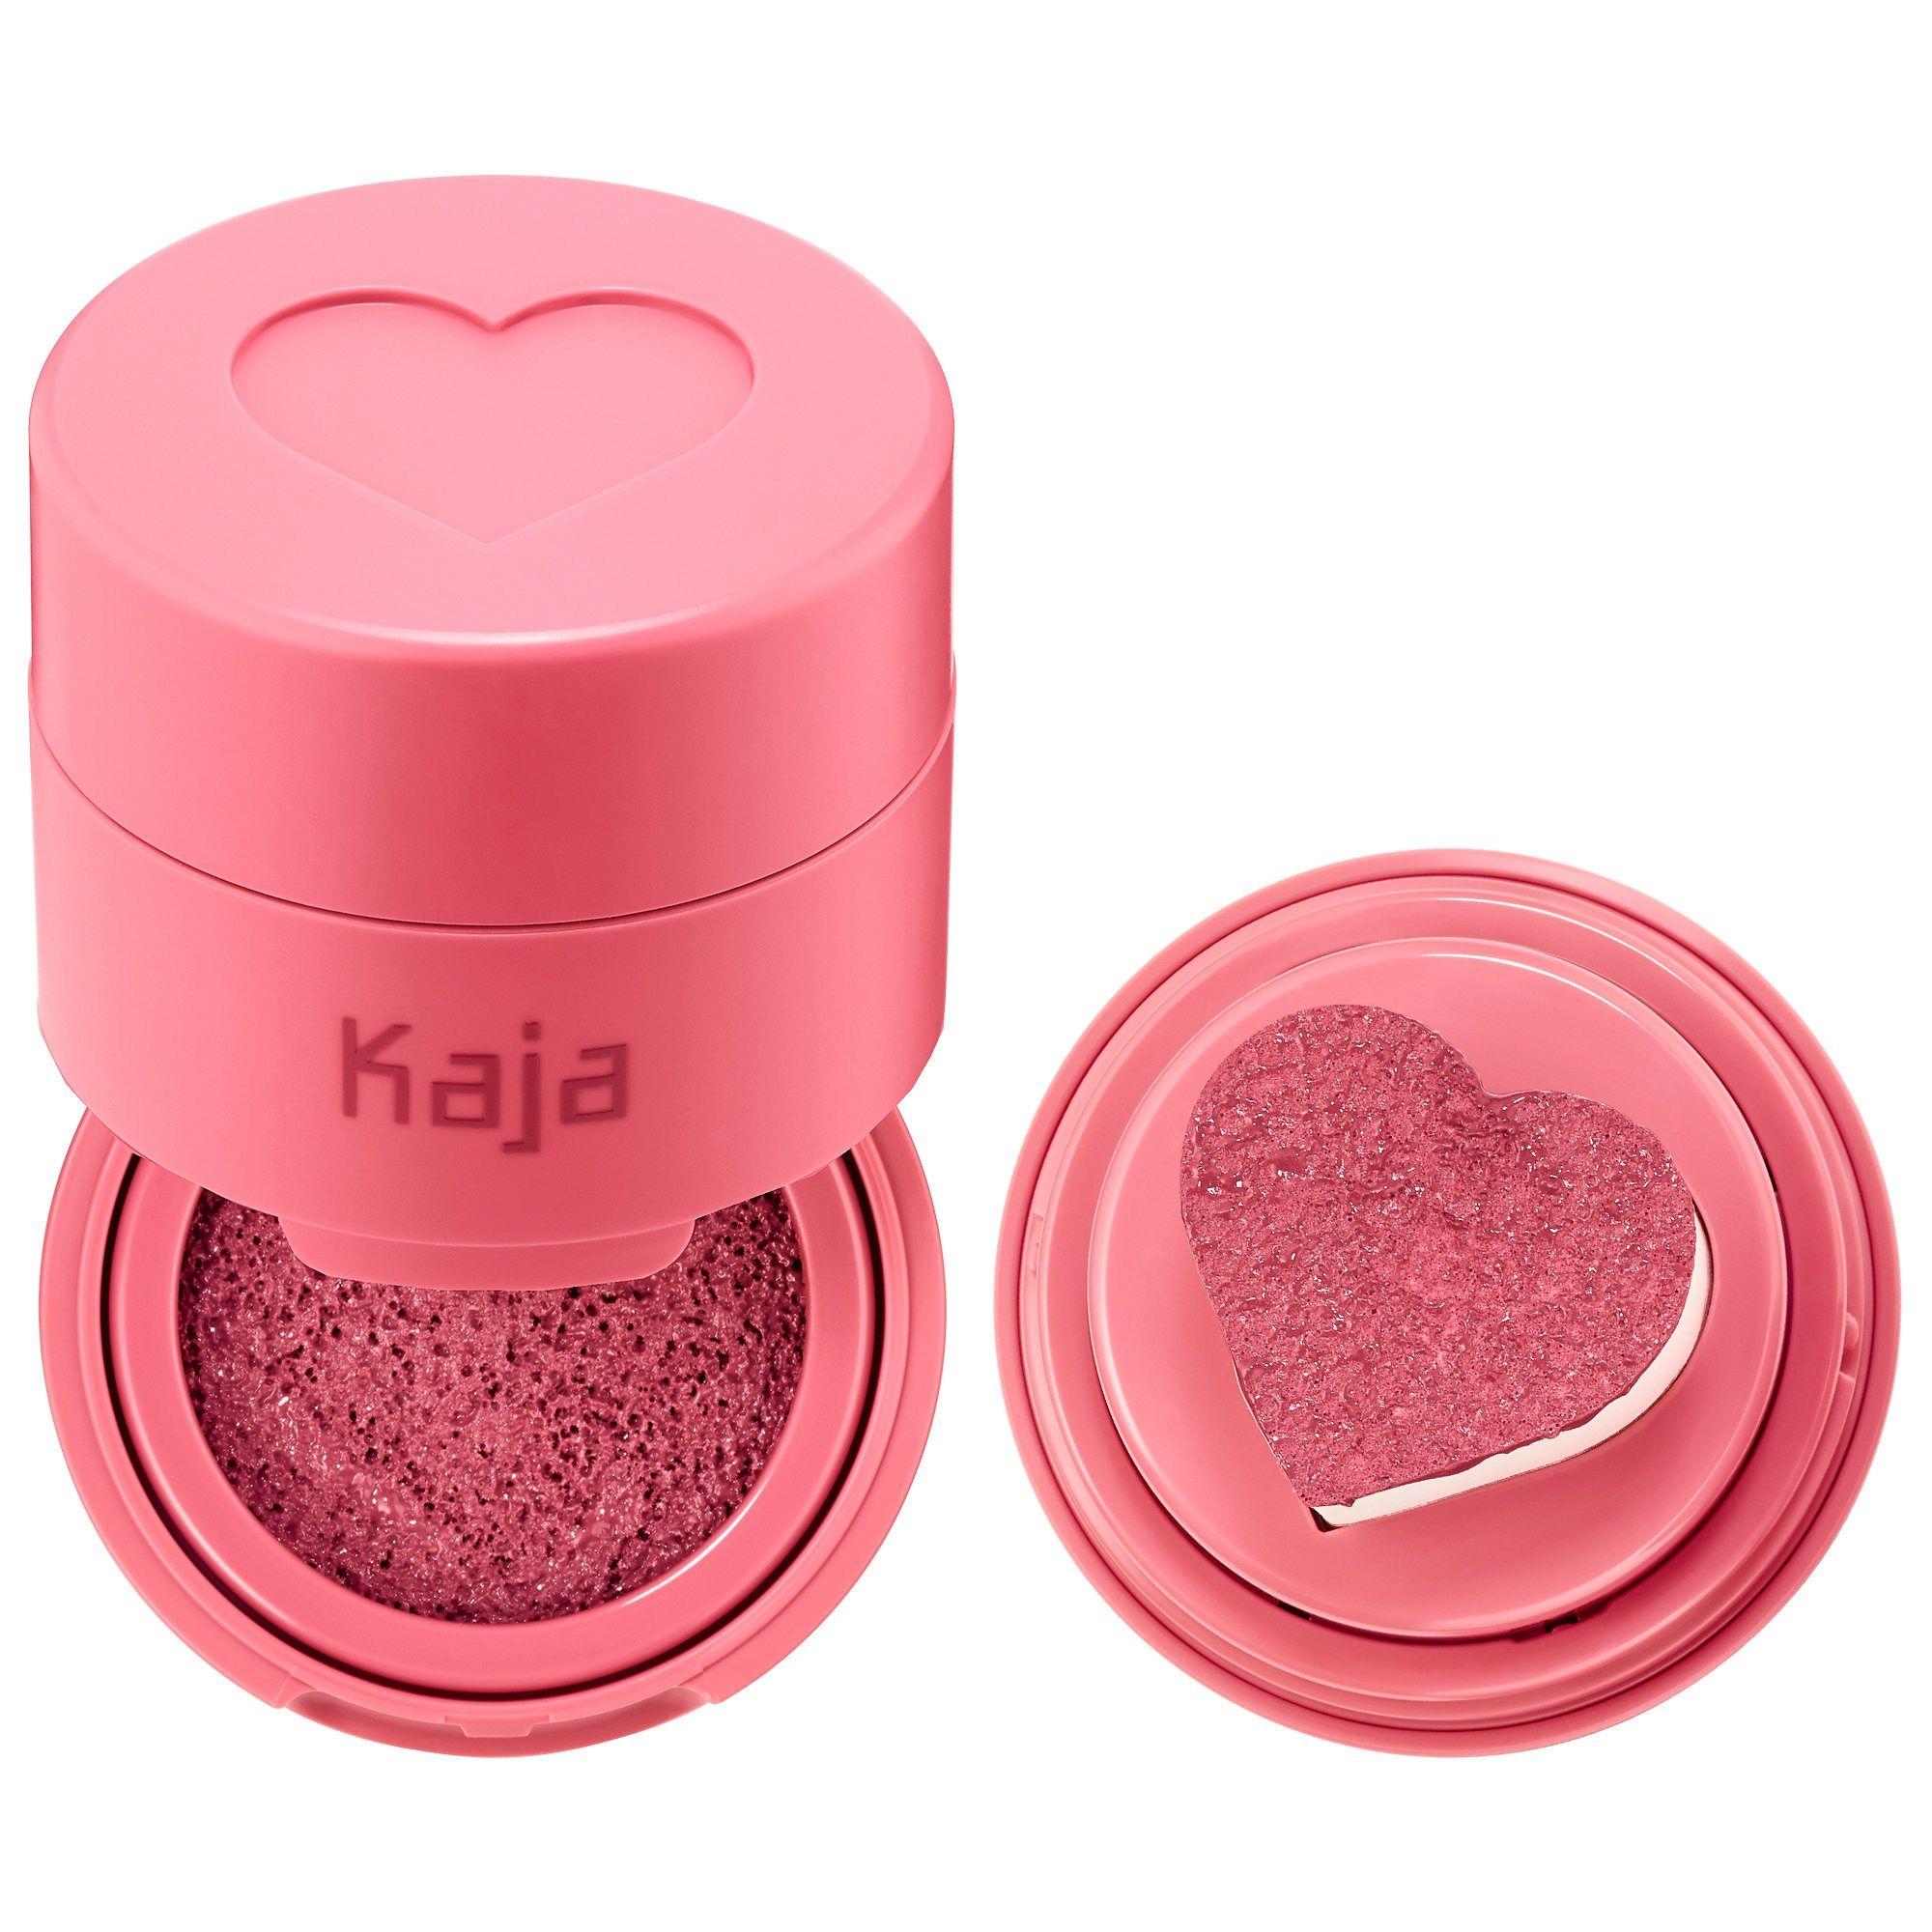 Cheeky Stamp Blendable Blush Blush, Sephora, Best makeup